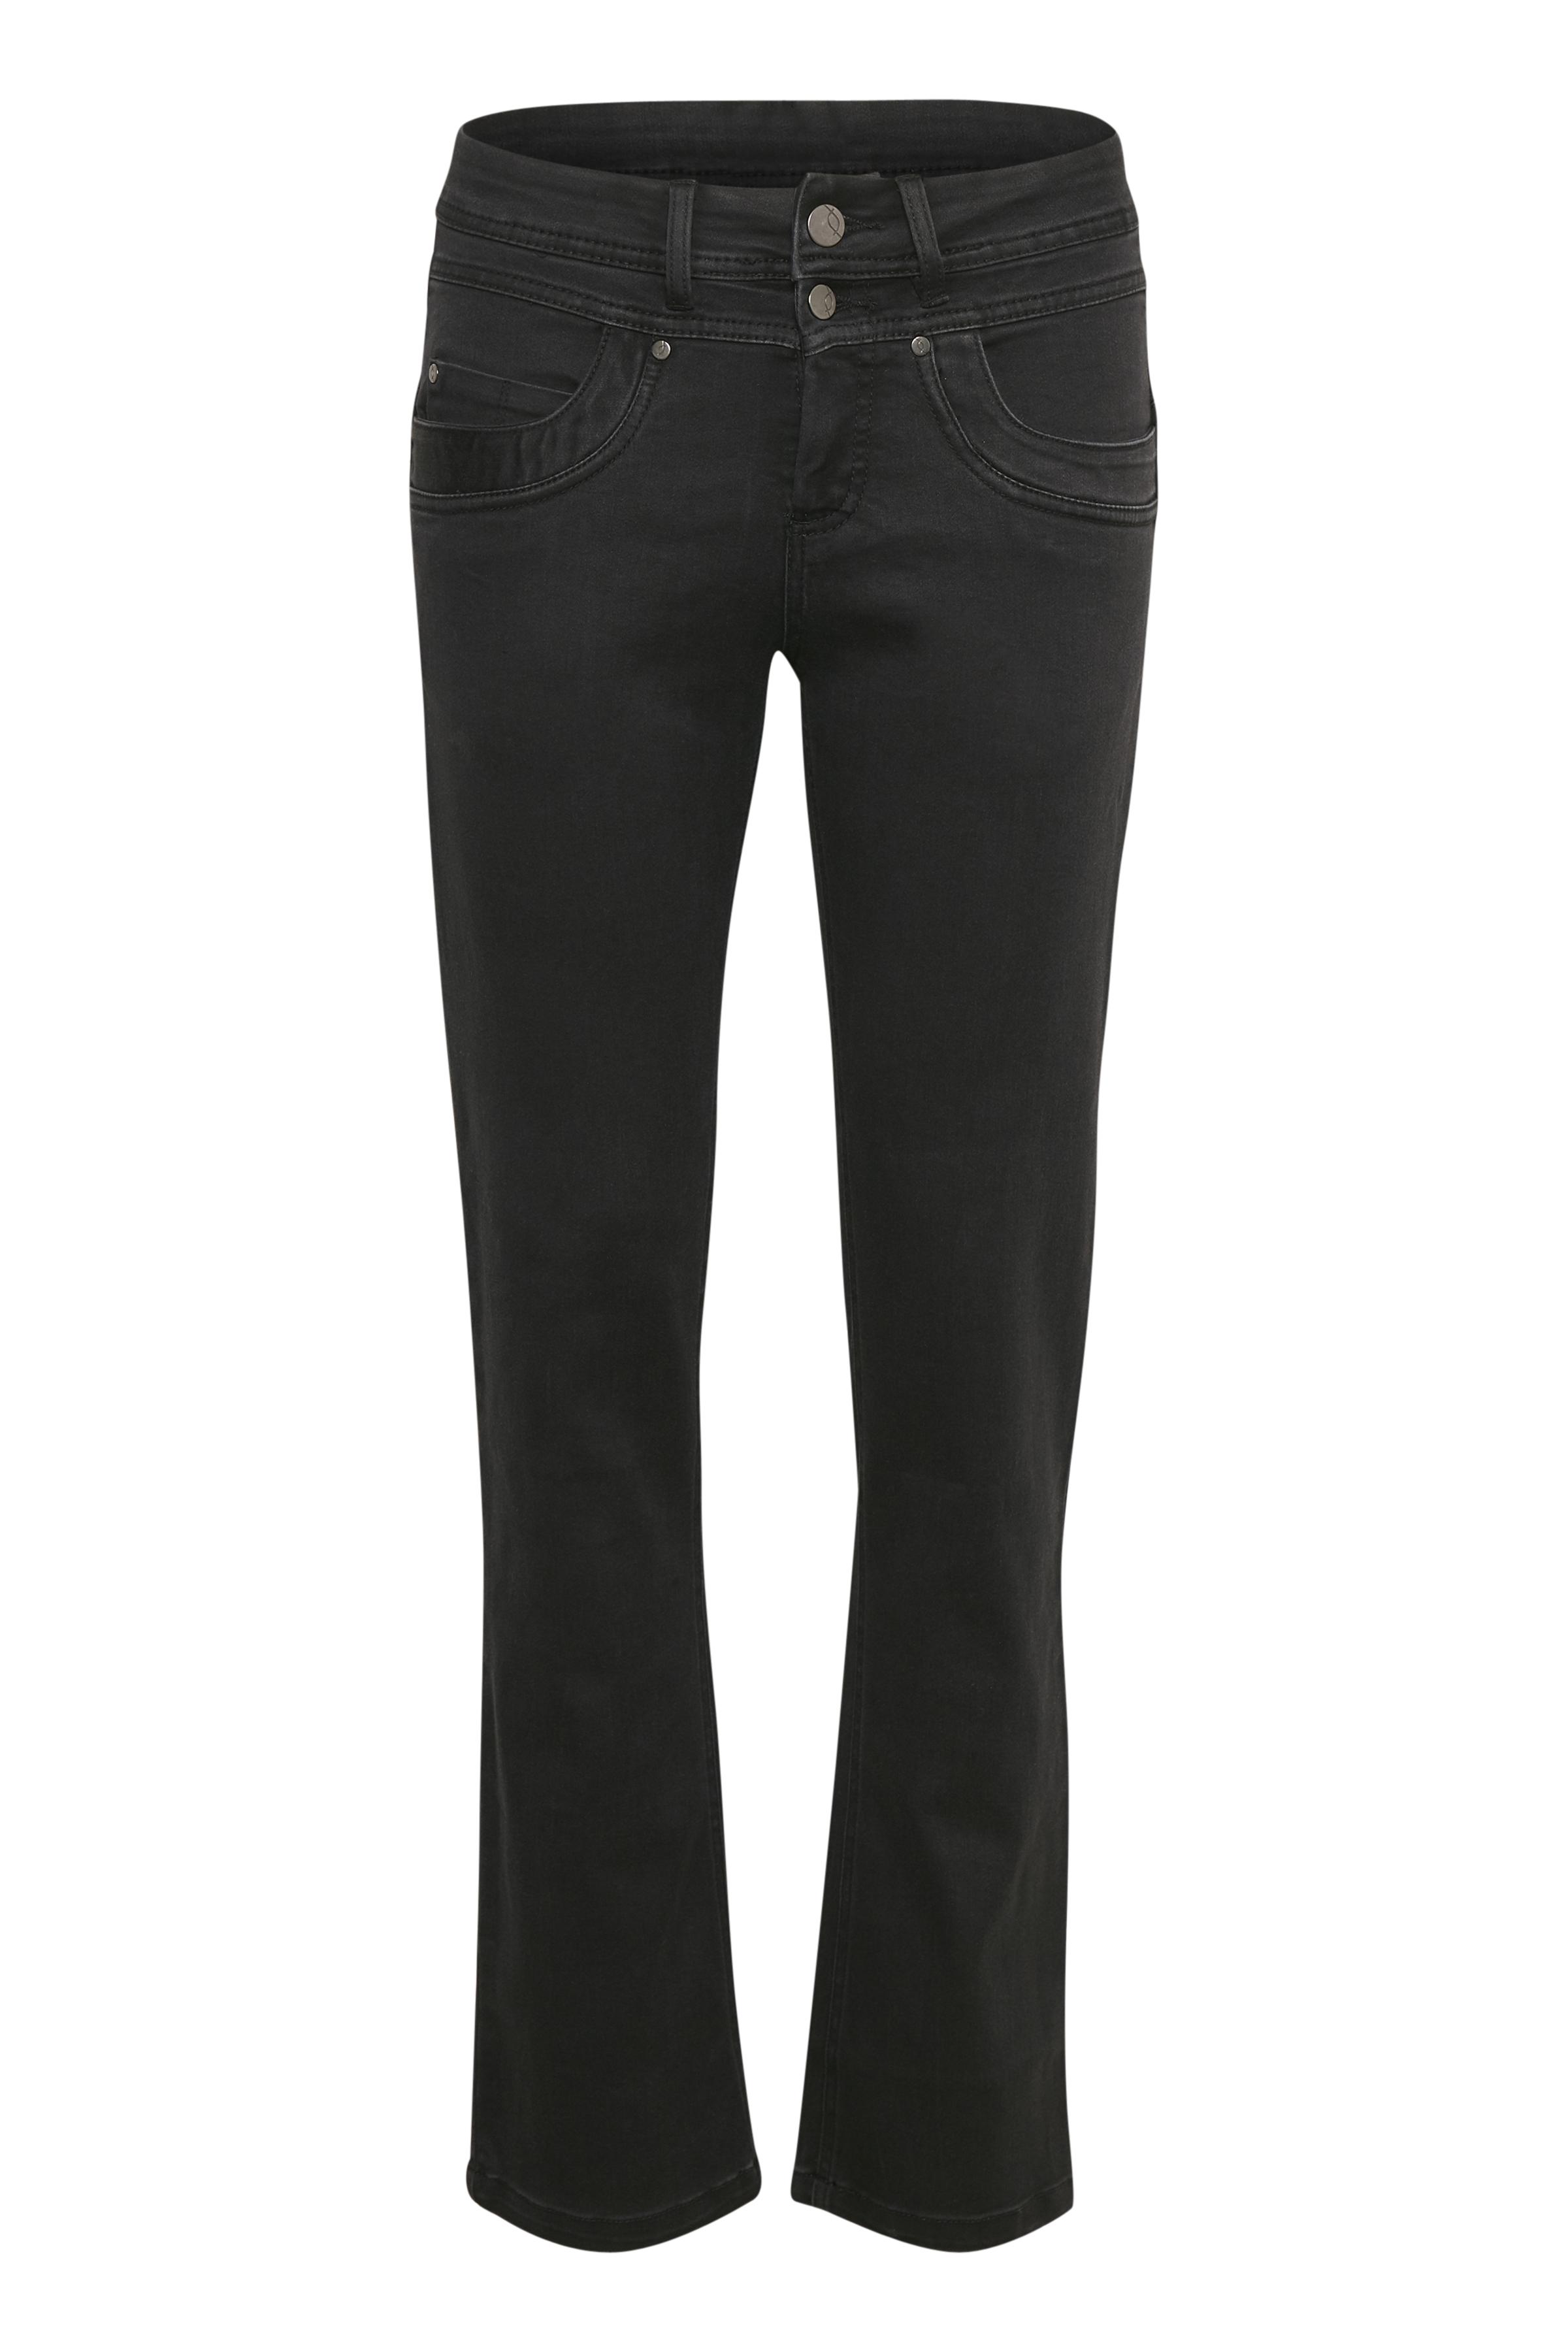 Fransa Dame Lækre Zotin jeans  - Sort denim